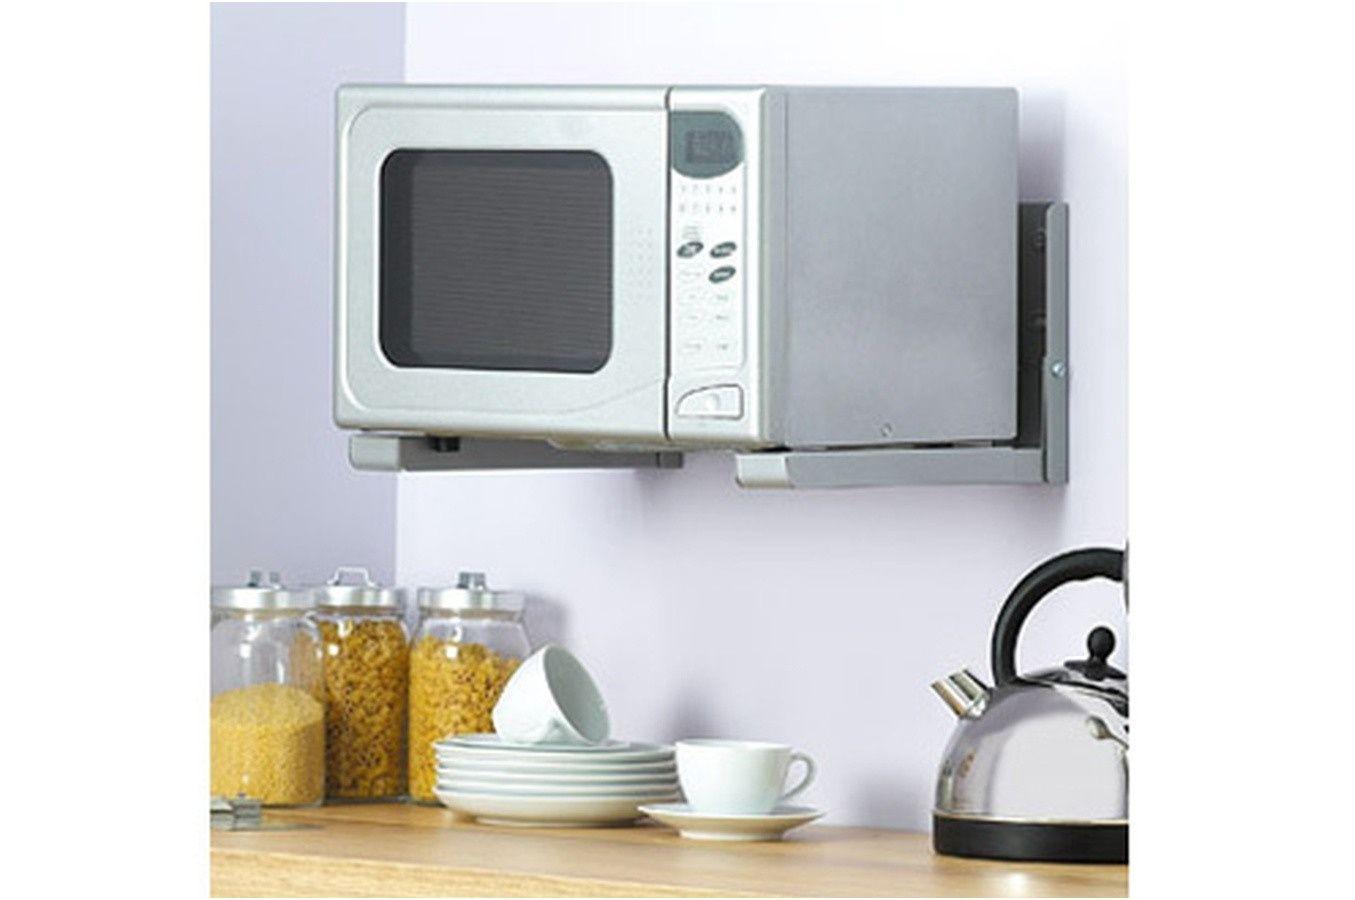 73 Terrific Etagere Micro Onde Brico Depot Gallery Check More At Https Www Danielle Leeman Com 73 Terrif Modern Kitchen Transforming Furniture Small Kitchen